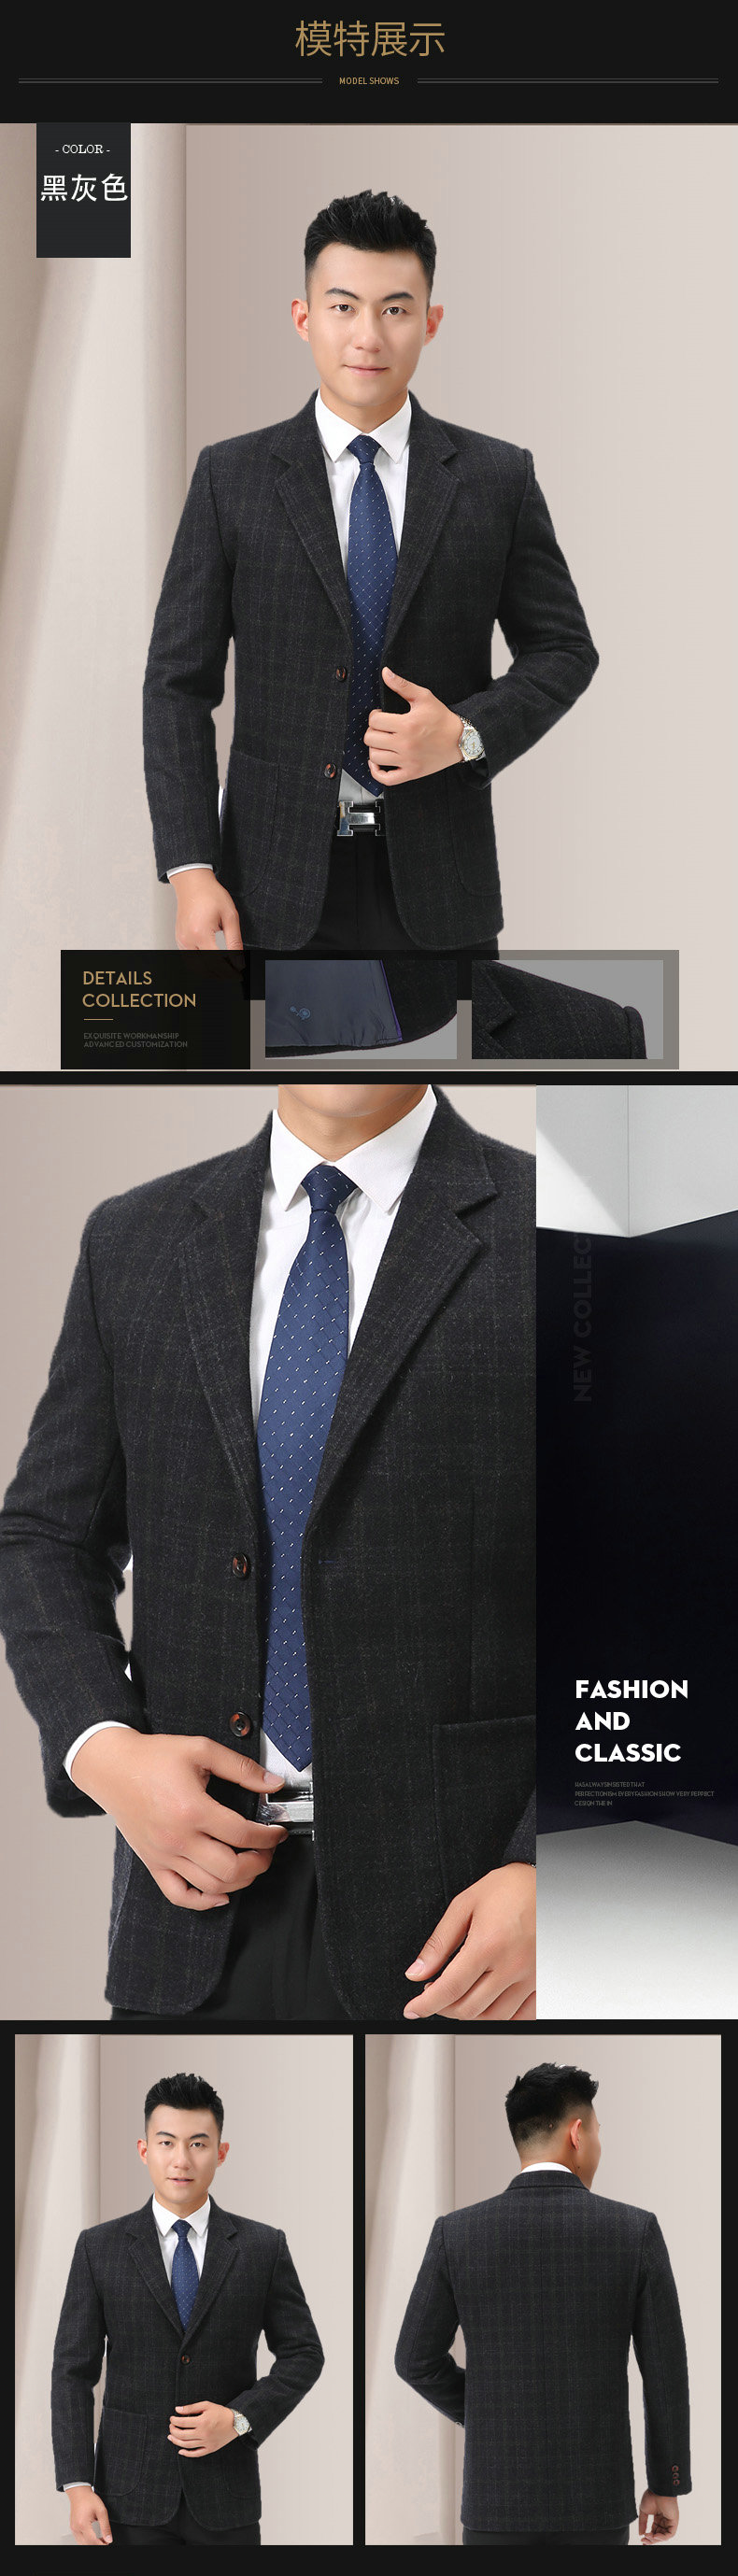 WAEOLSA Man Wool Blazer Plaid Jacket Suit Men Woollen Blends Garment Male Smart Casual Balzers Black Gray Jacket Suit Man (6)